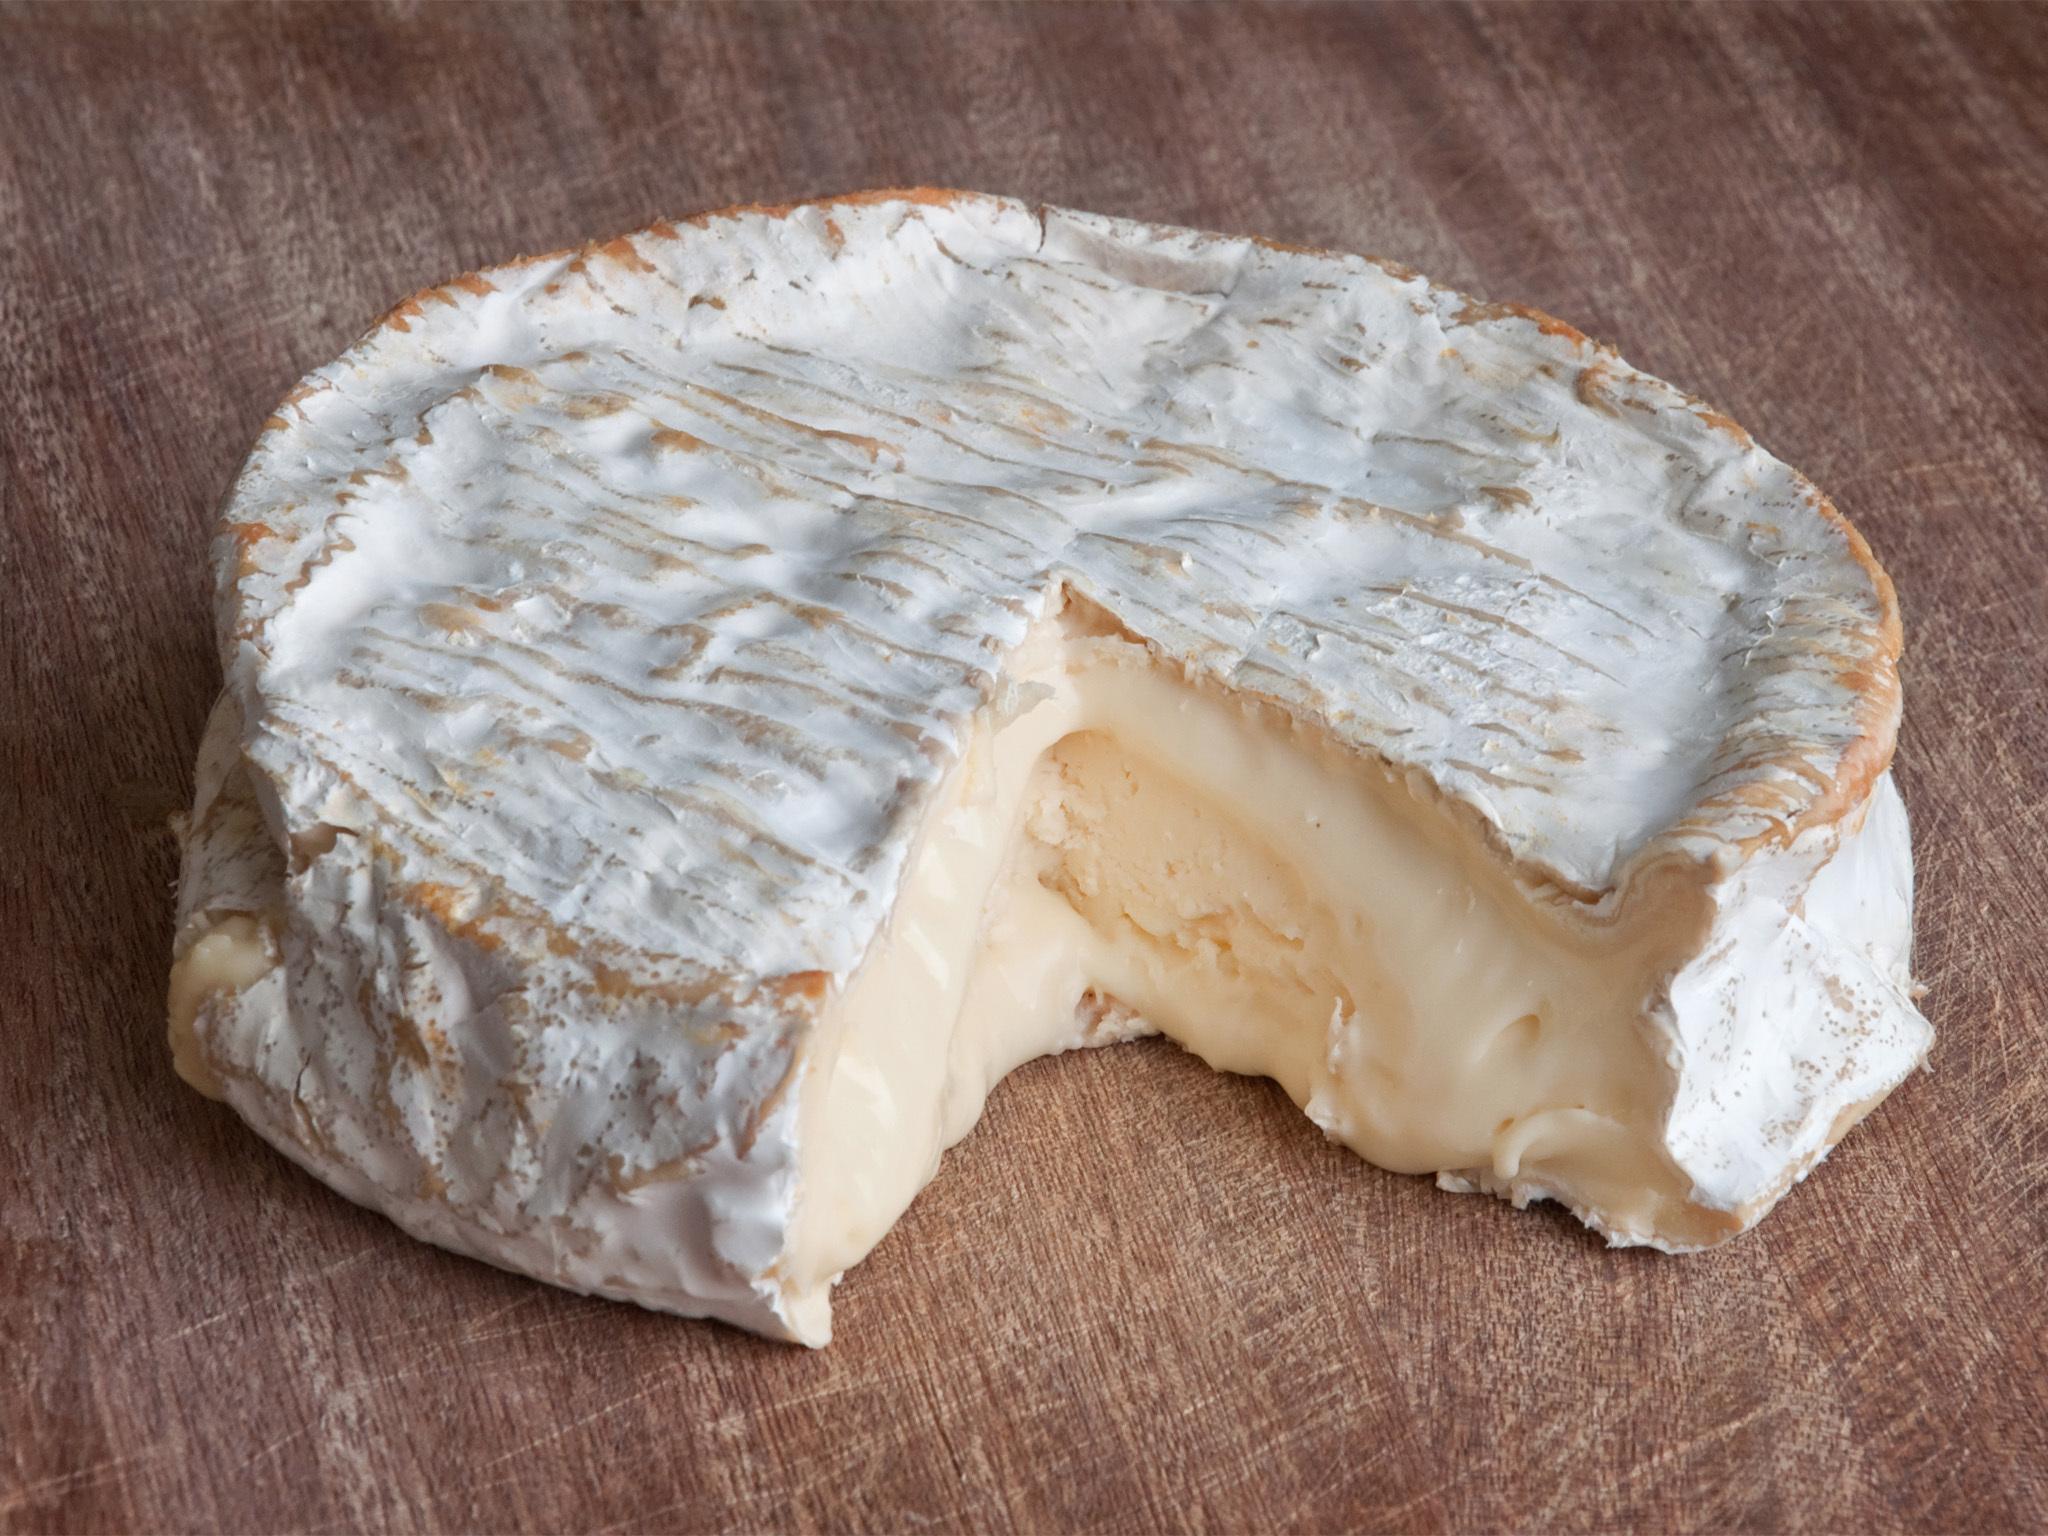 Generic soft cheese